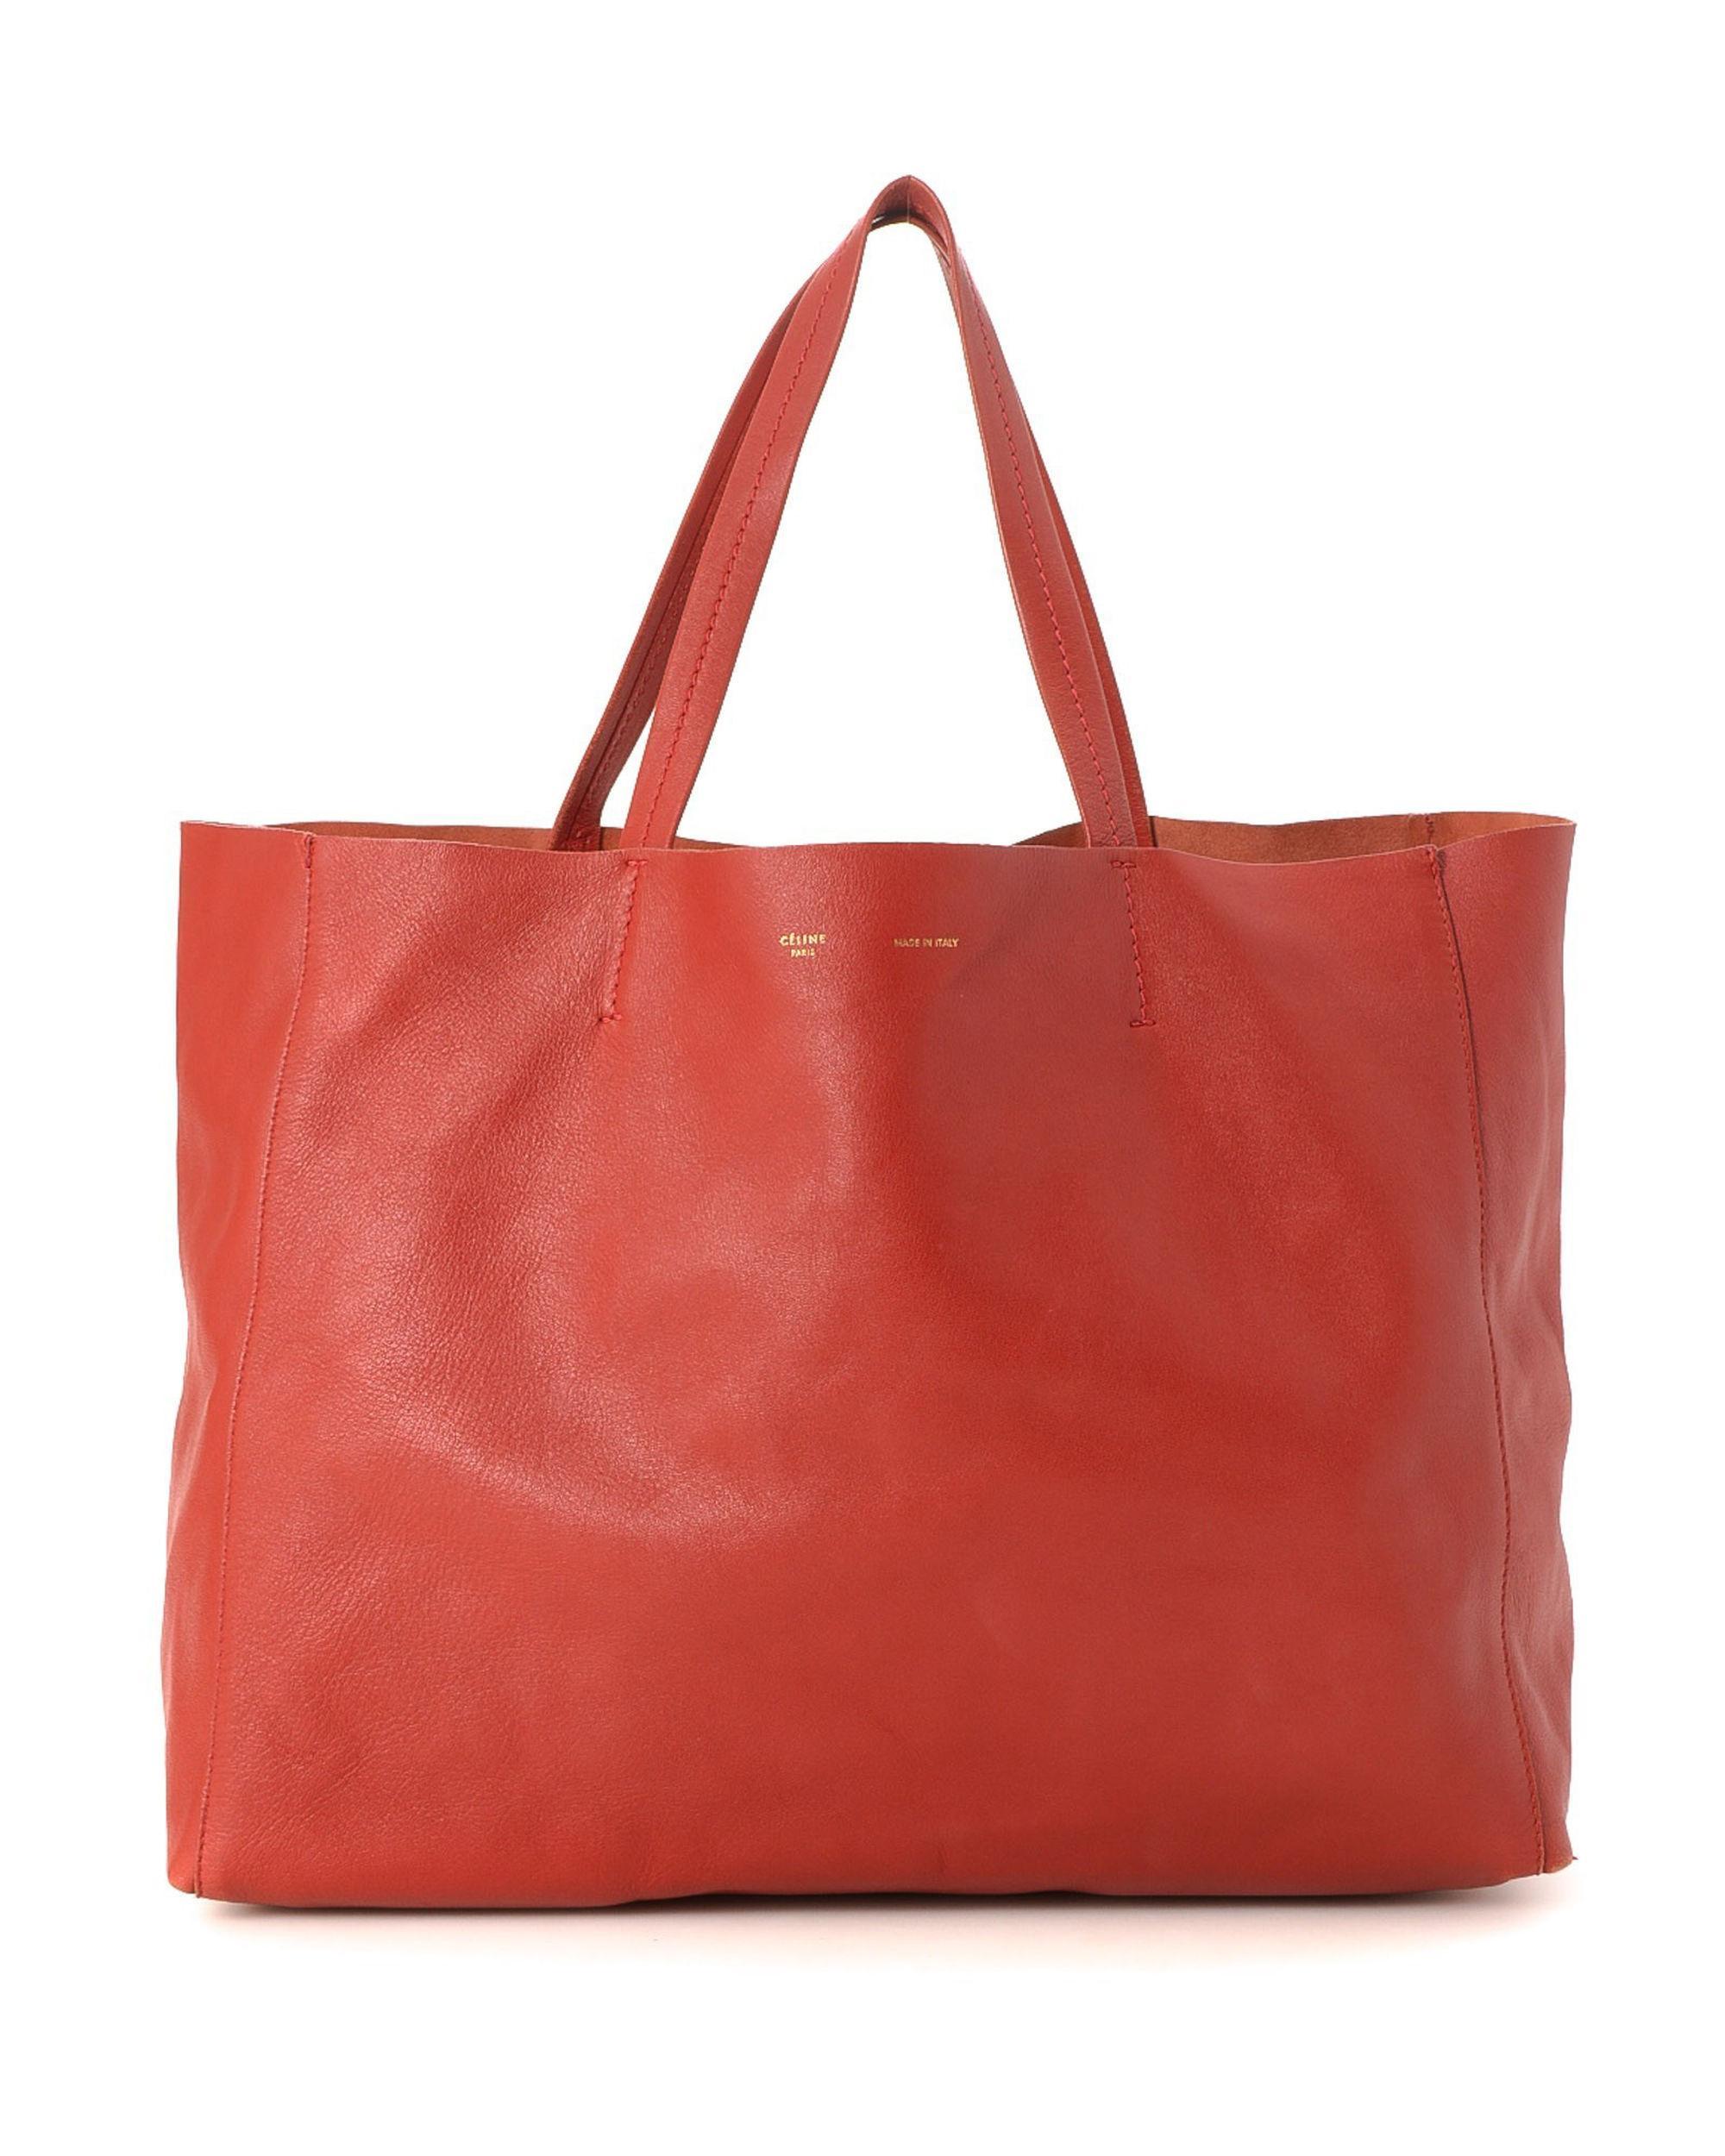 826d7bafa4 Lyst - Céline Cabas Horizontal Tote Bag - Vintage in Red